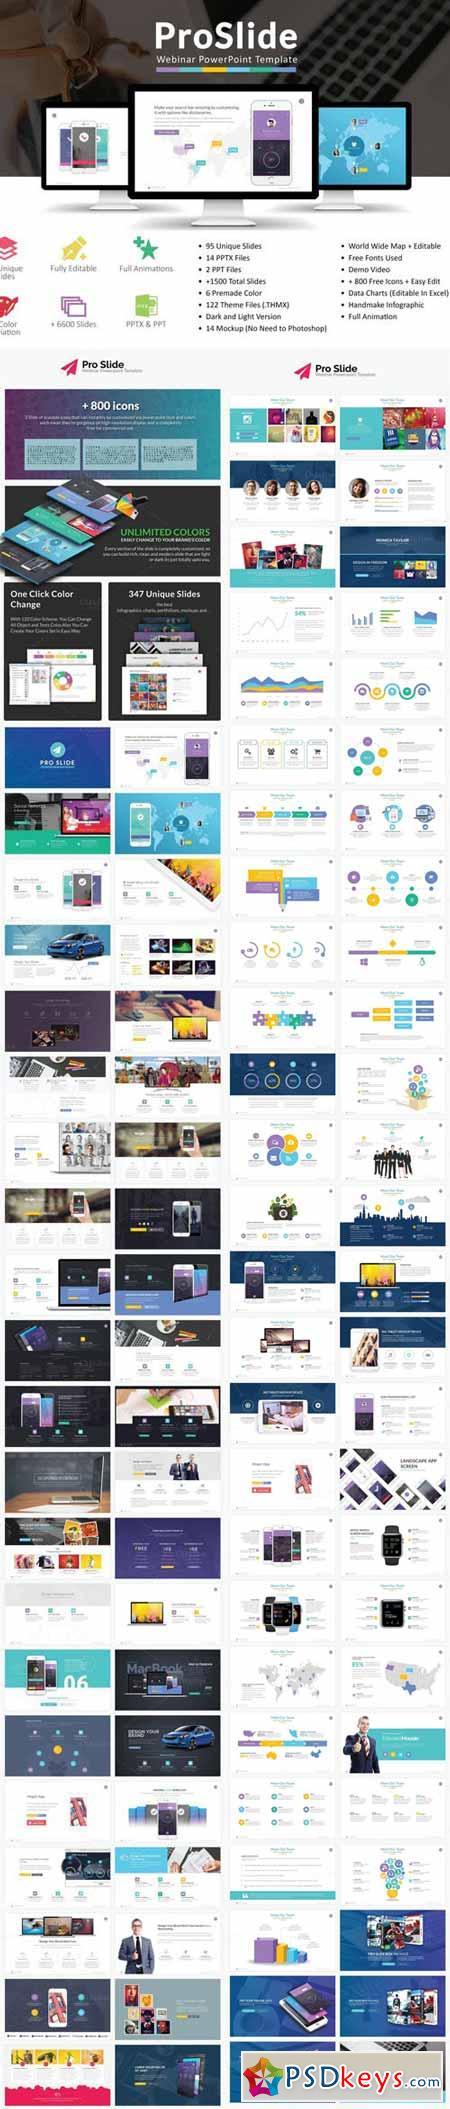 proslide webinar powerpoint template 468826 » free download, Presentation templates